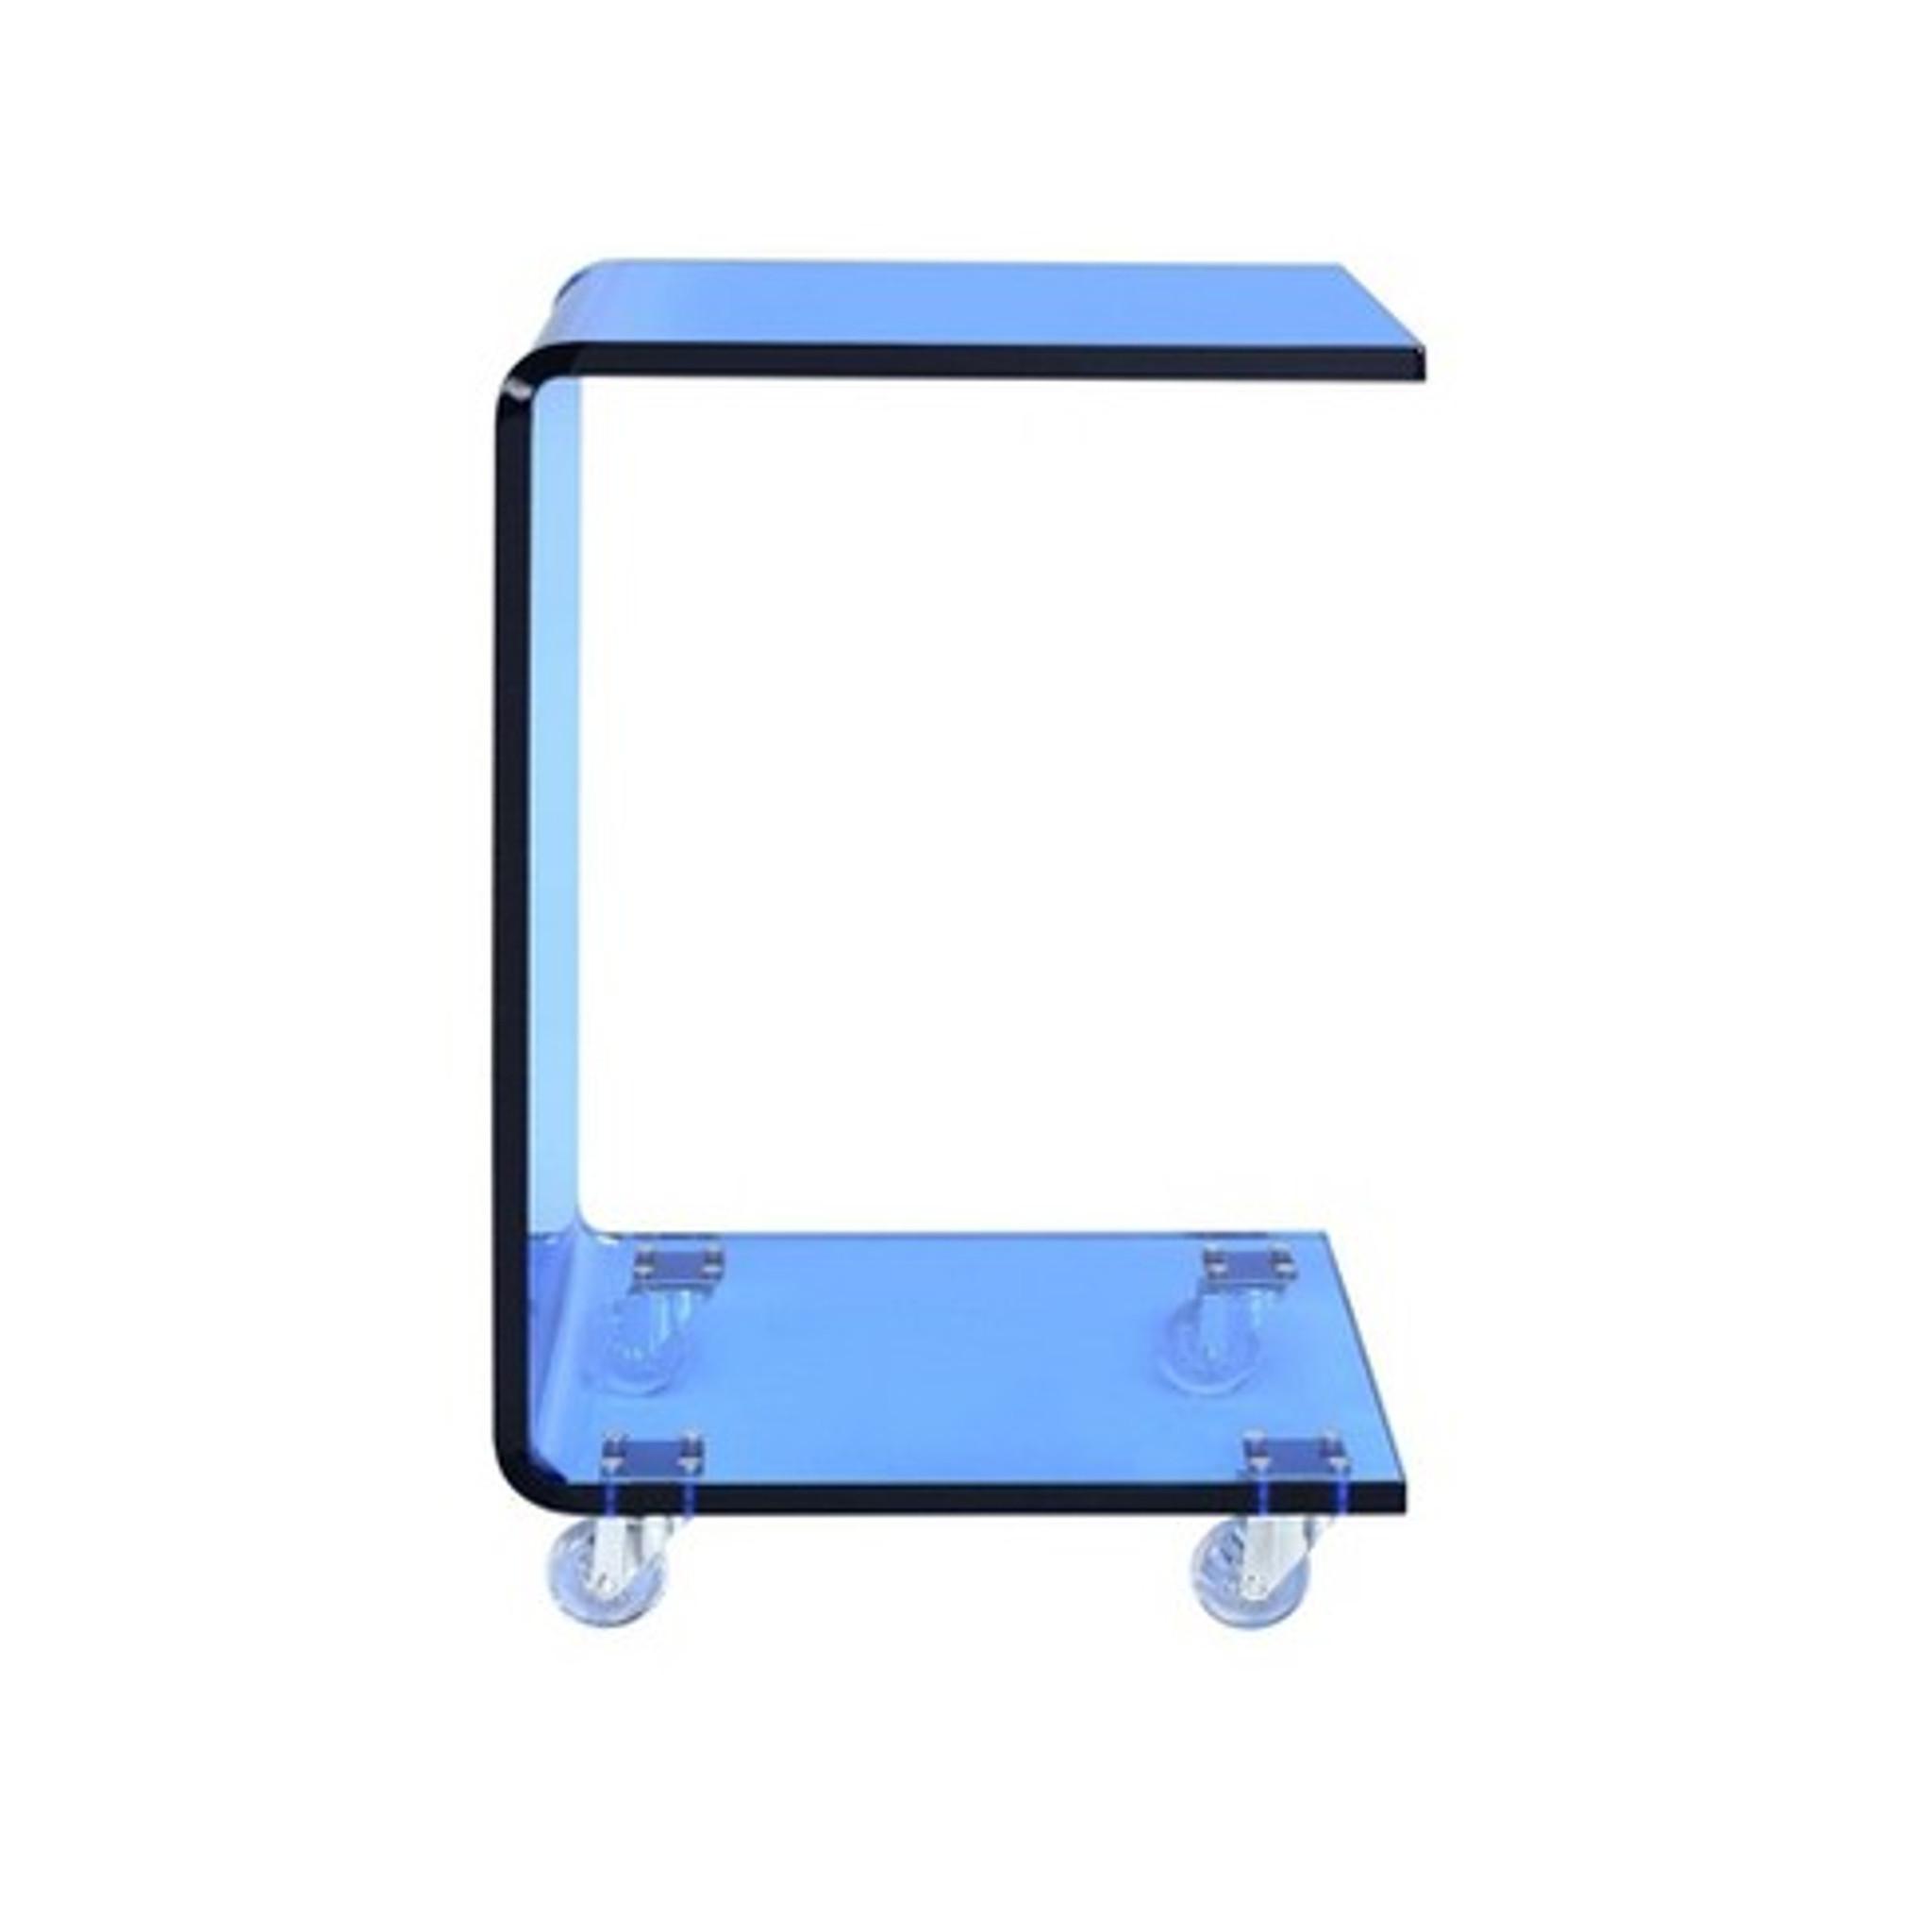 Picket House Furnishings Peek Acrylic Snack Table in Blue